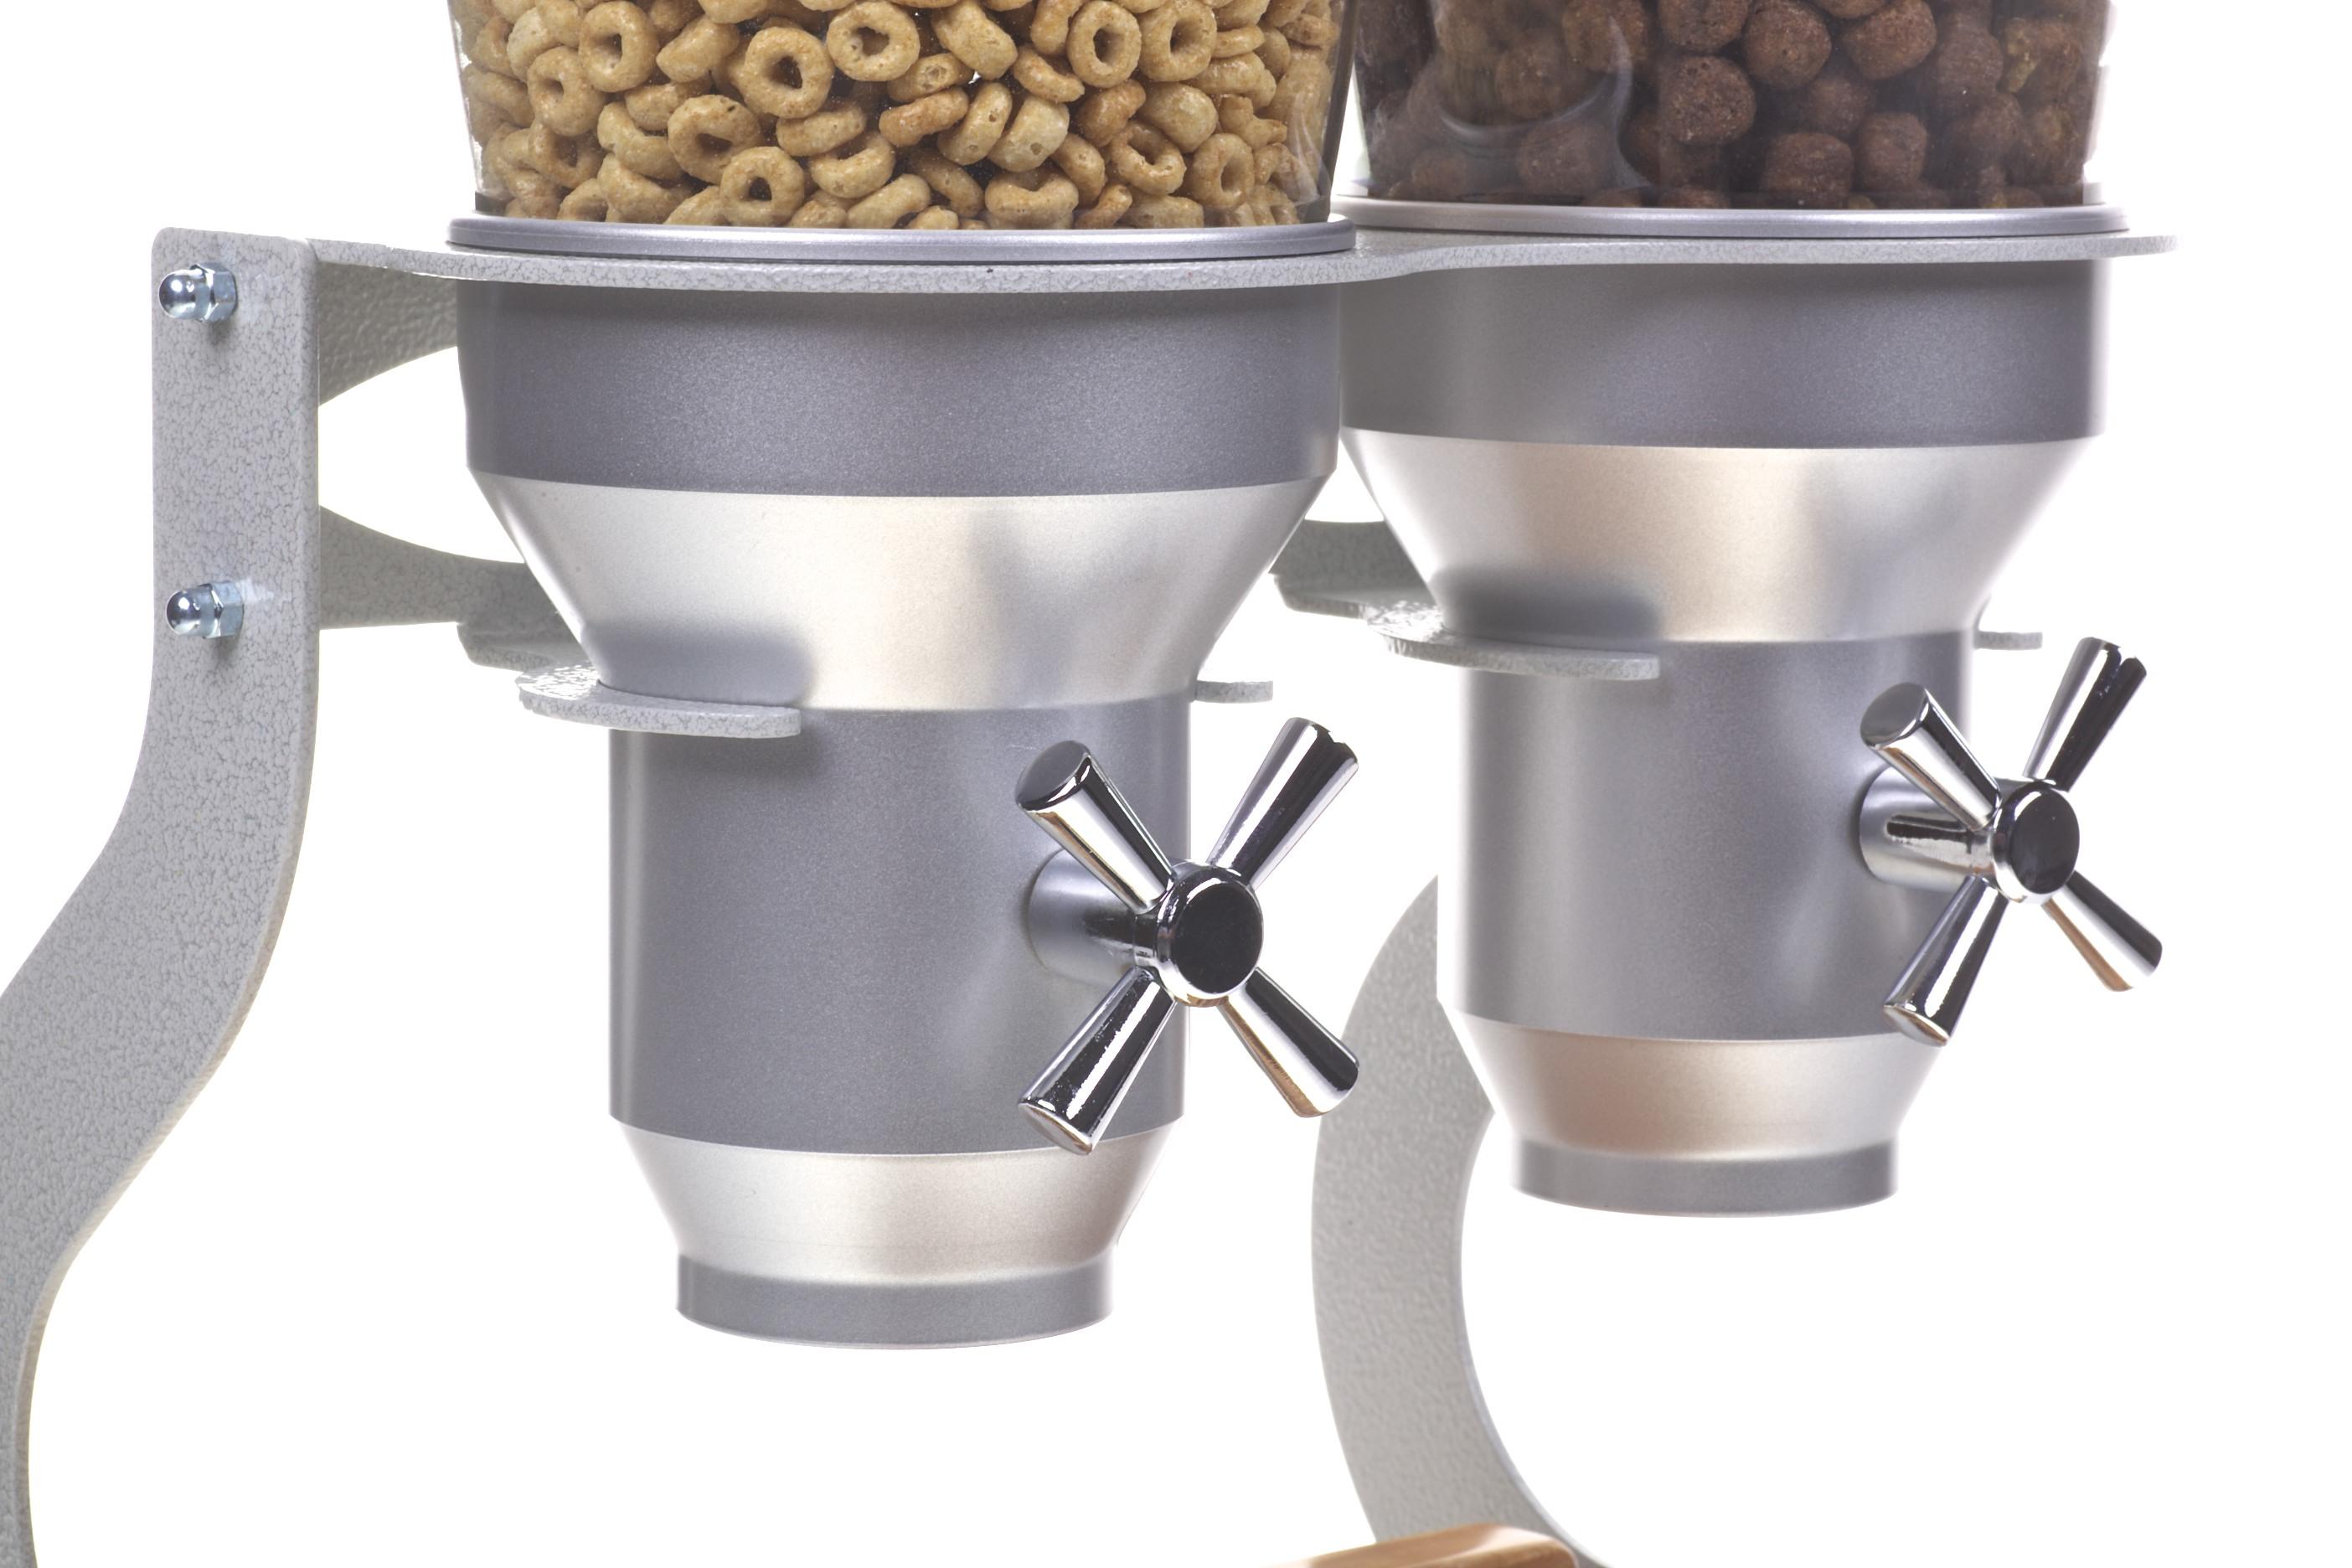 d20-cereal-dispenser-3-.jpg